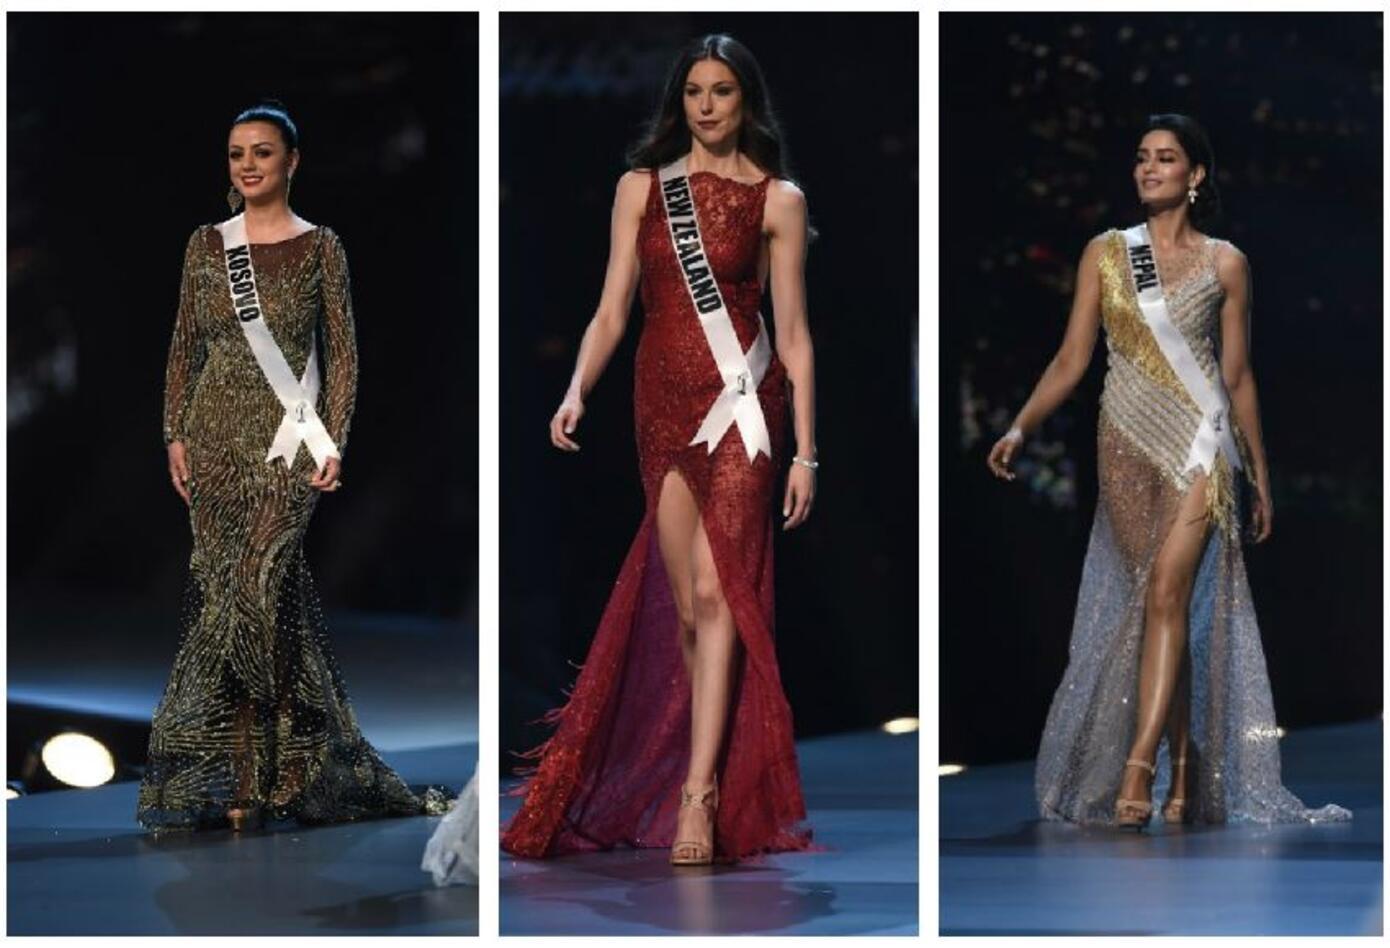 Miss Kosovo, Miss Nueva Zelanda, Miss Nepal